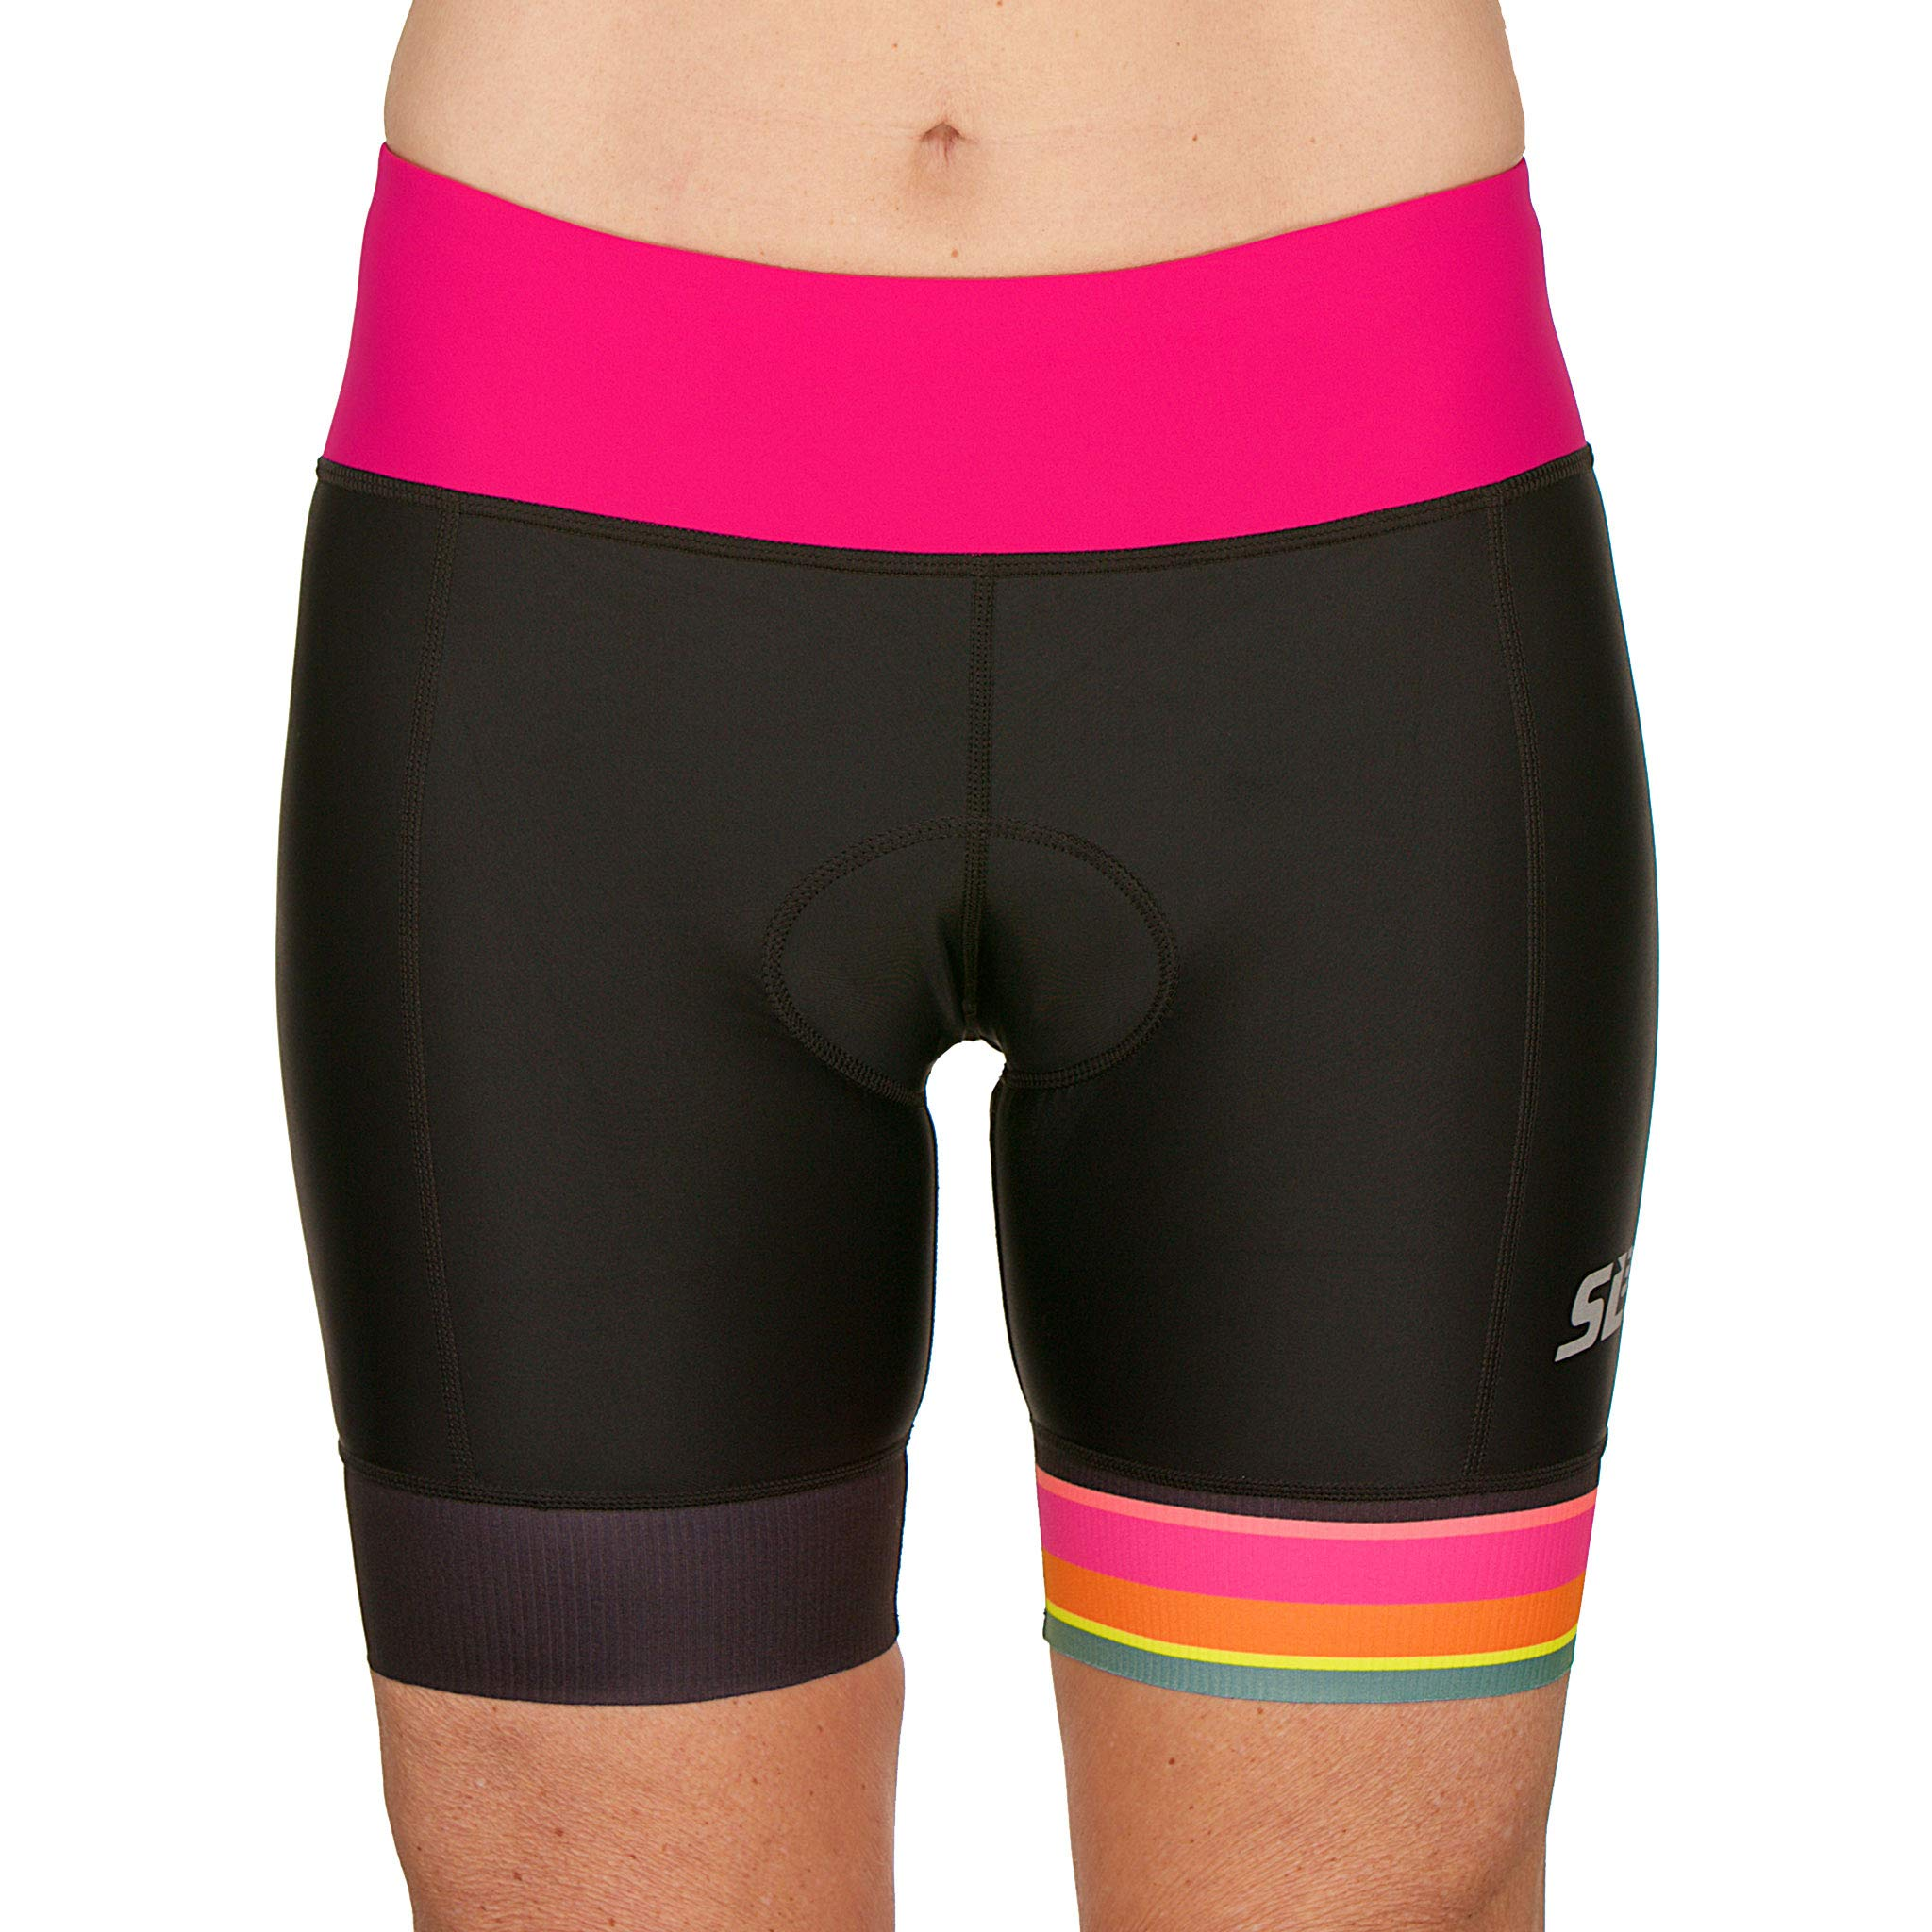 SLS3 Womens Triathlon Shorts FRT | 6 inch Black Women Tri Short | Super Comfy Tri-Shorts with Soft Chamois | German Designed (Black/Bright Rose, Small)